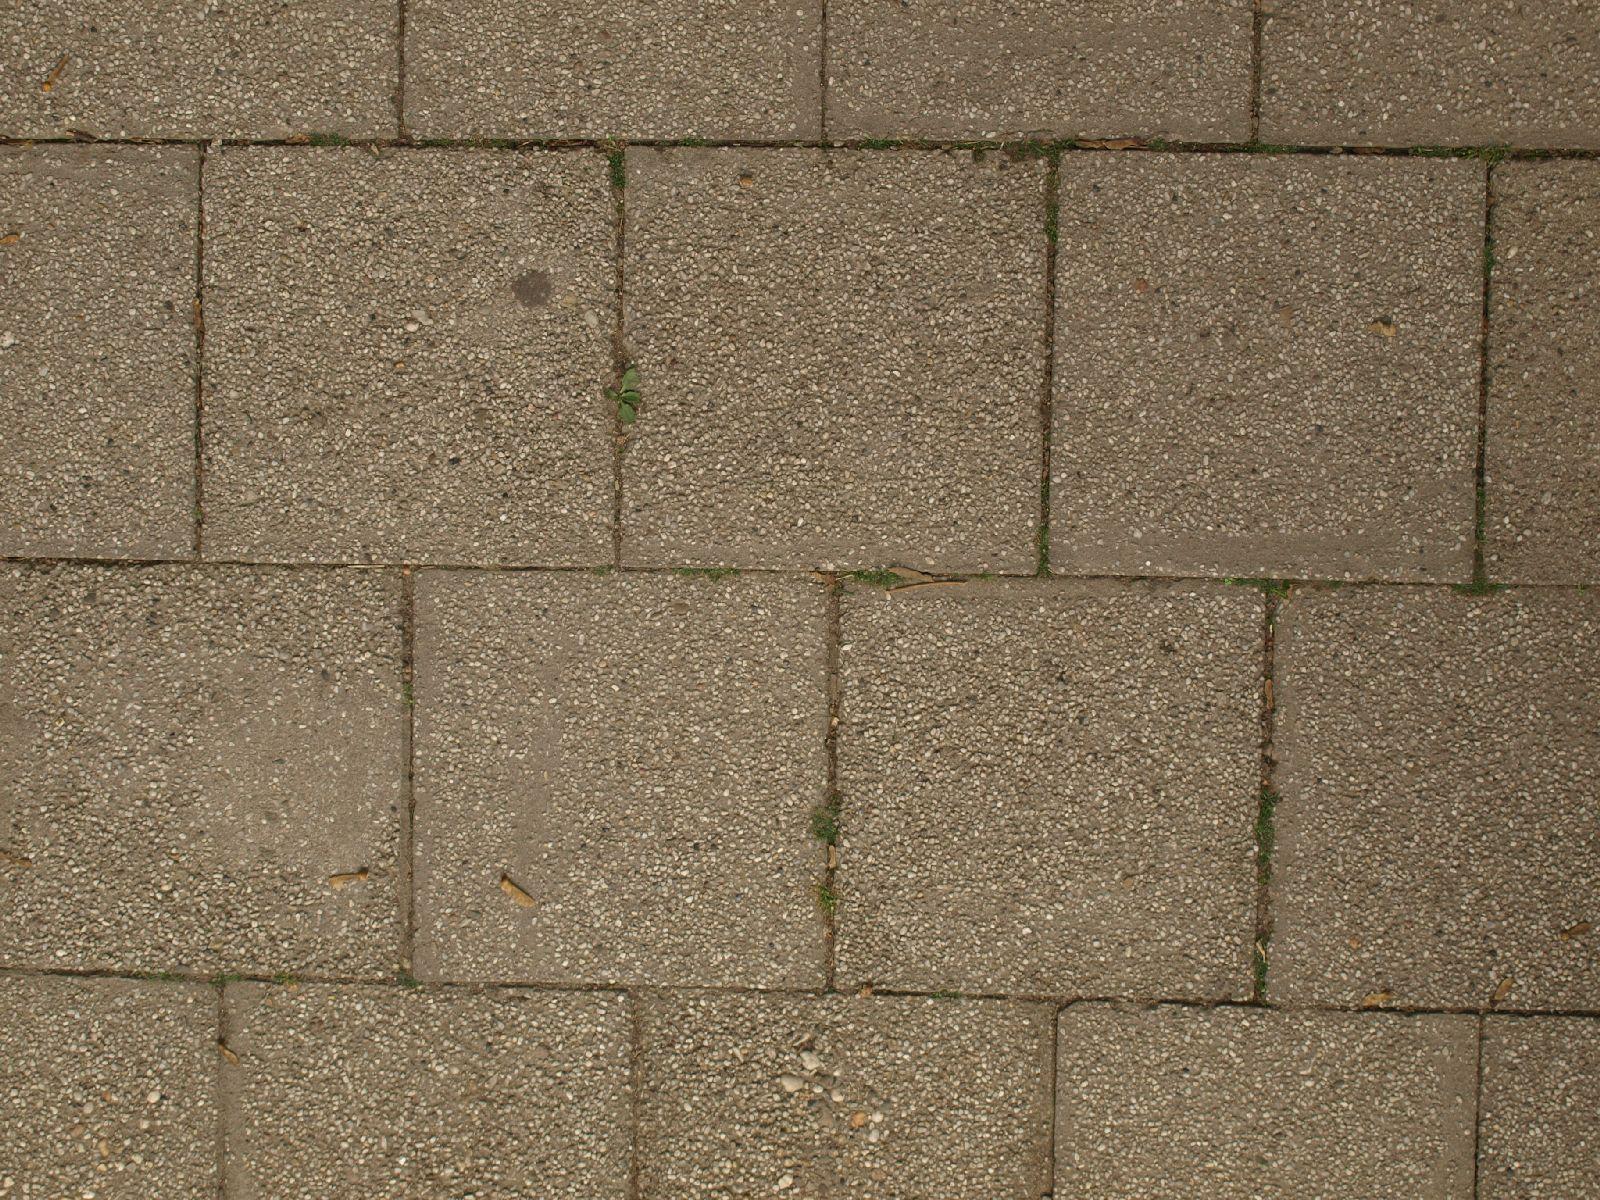 Boden-Gehweg-Strasse-Buergersteig-Textur_A_PA039932